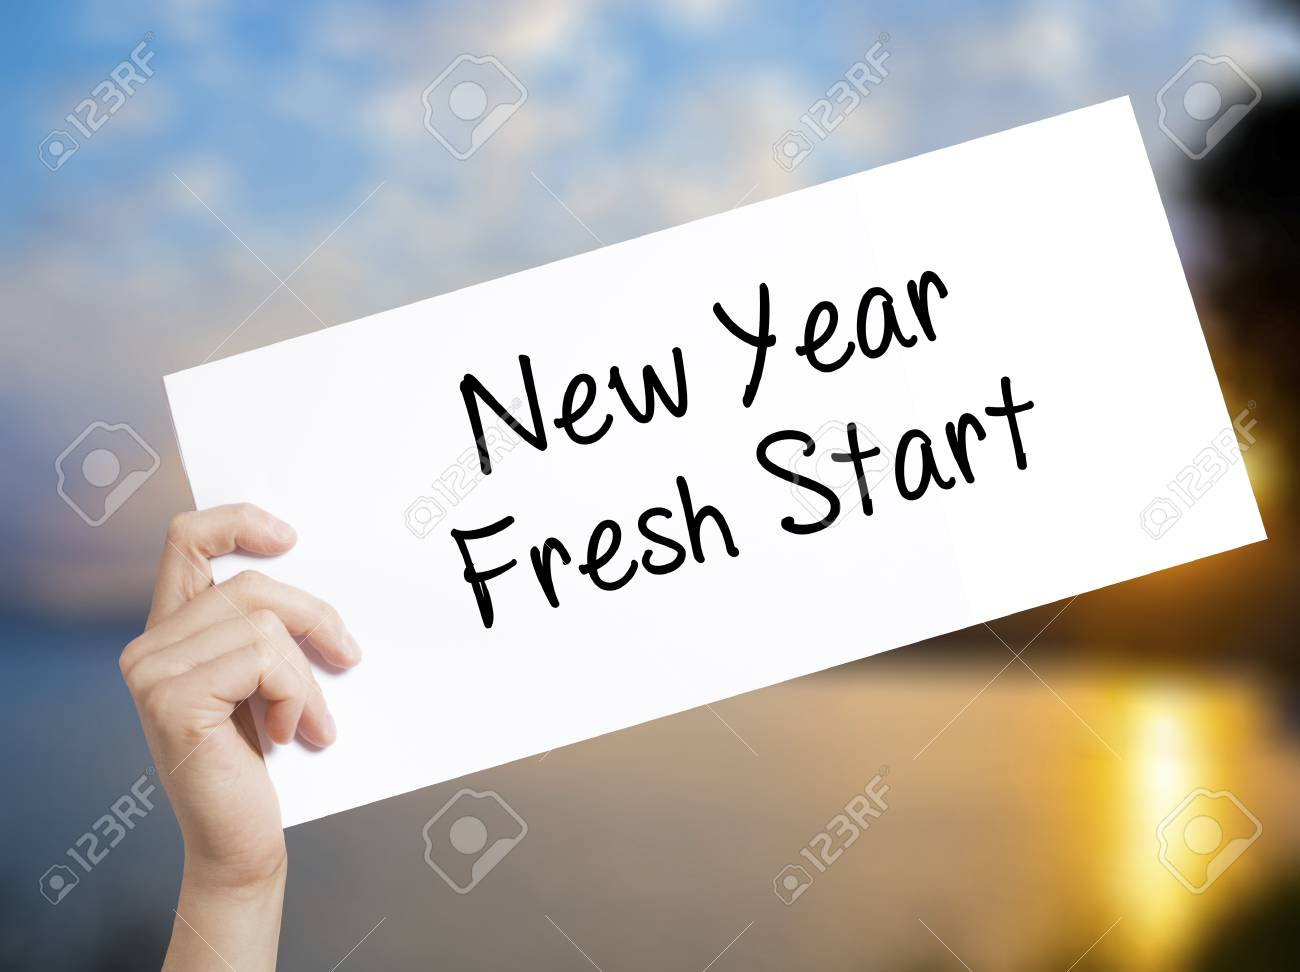 New Year Fresh Start Sign On White Paper. Man Hand Holding Paper ...